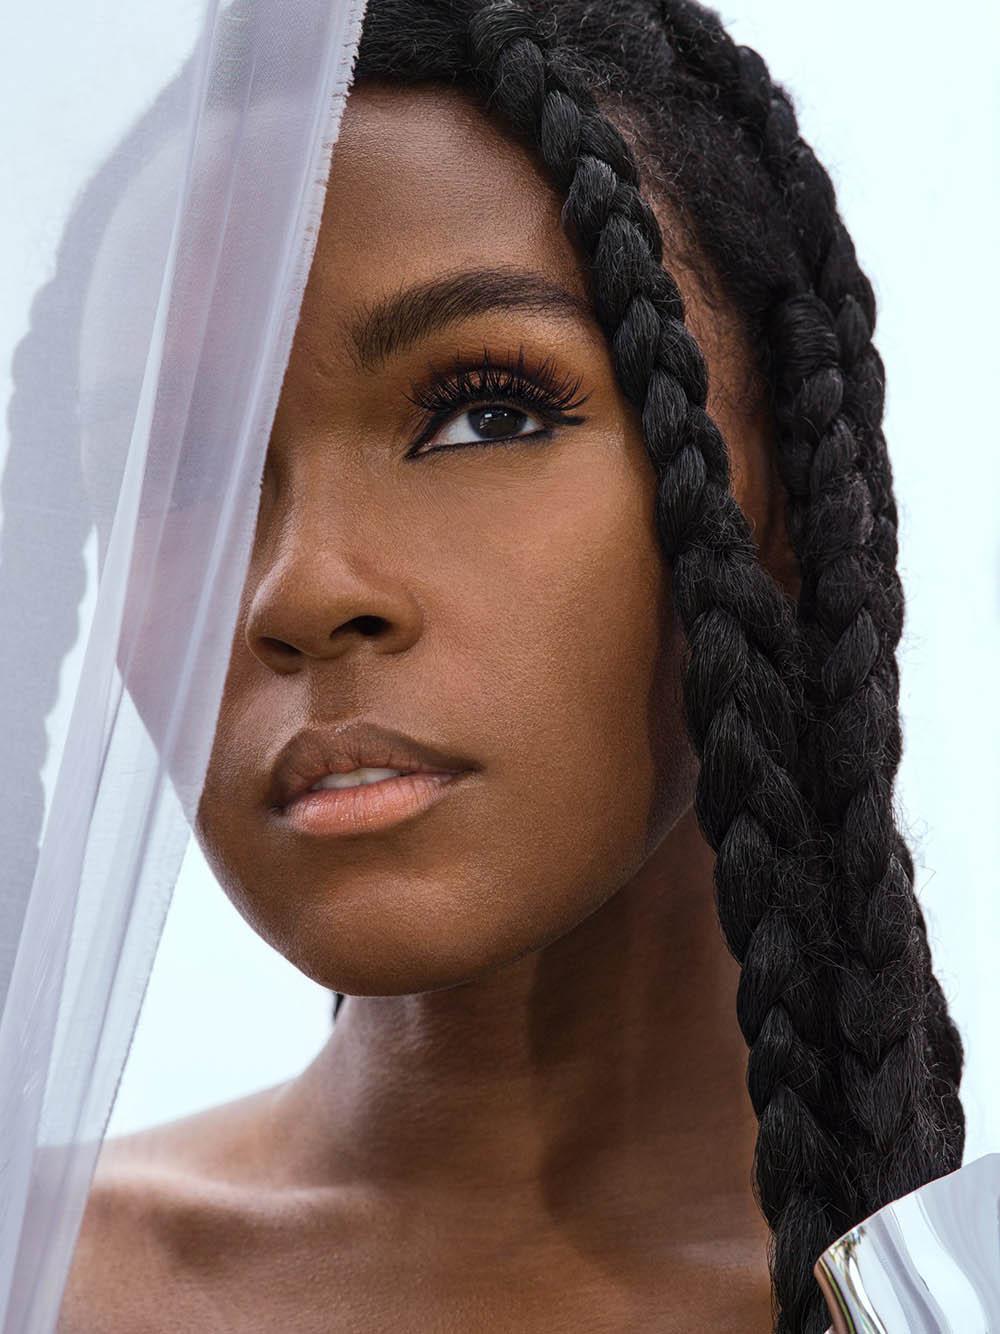 Janelle Monáe covers Shape Magazine September 2020 by Dana Scruggs